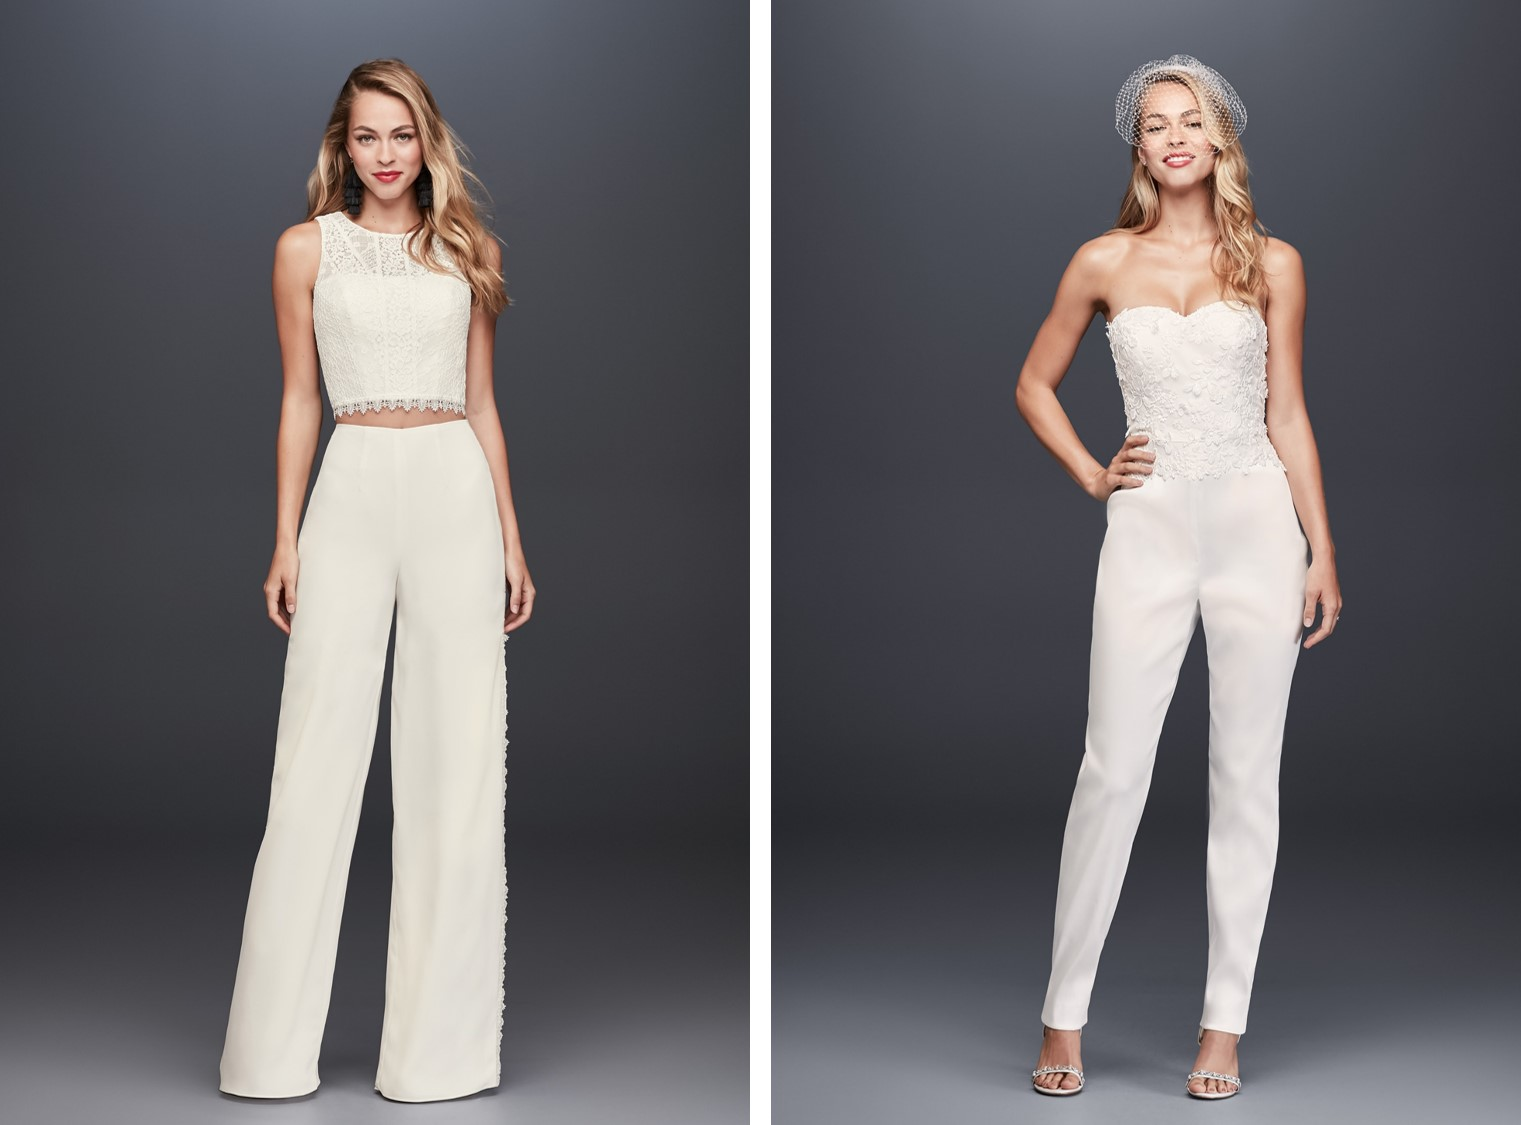 Women modeling bridal jumpsuits